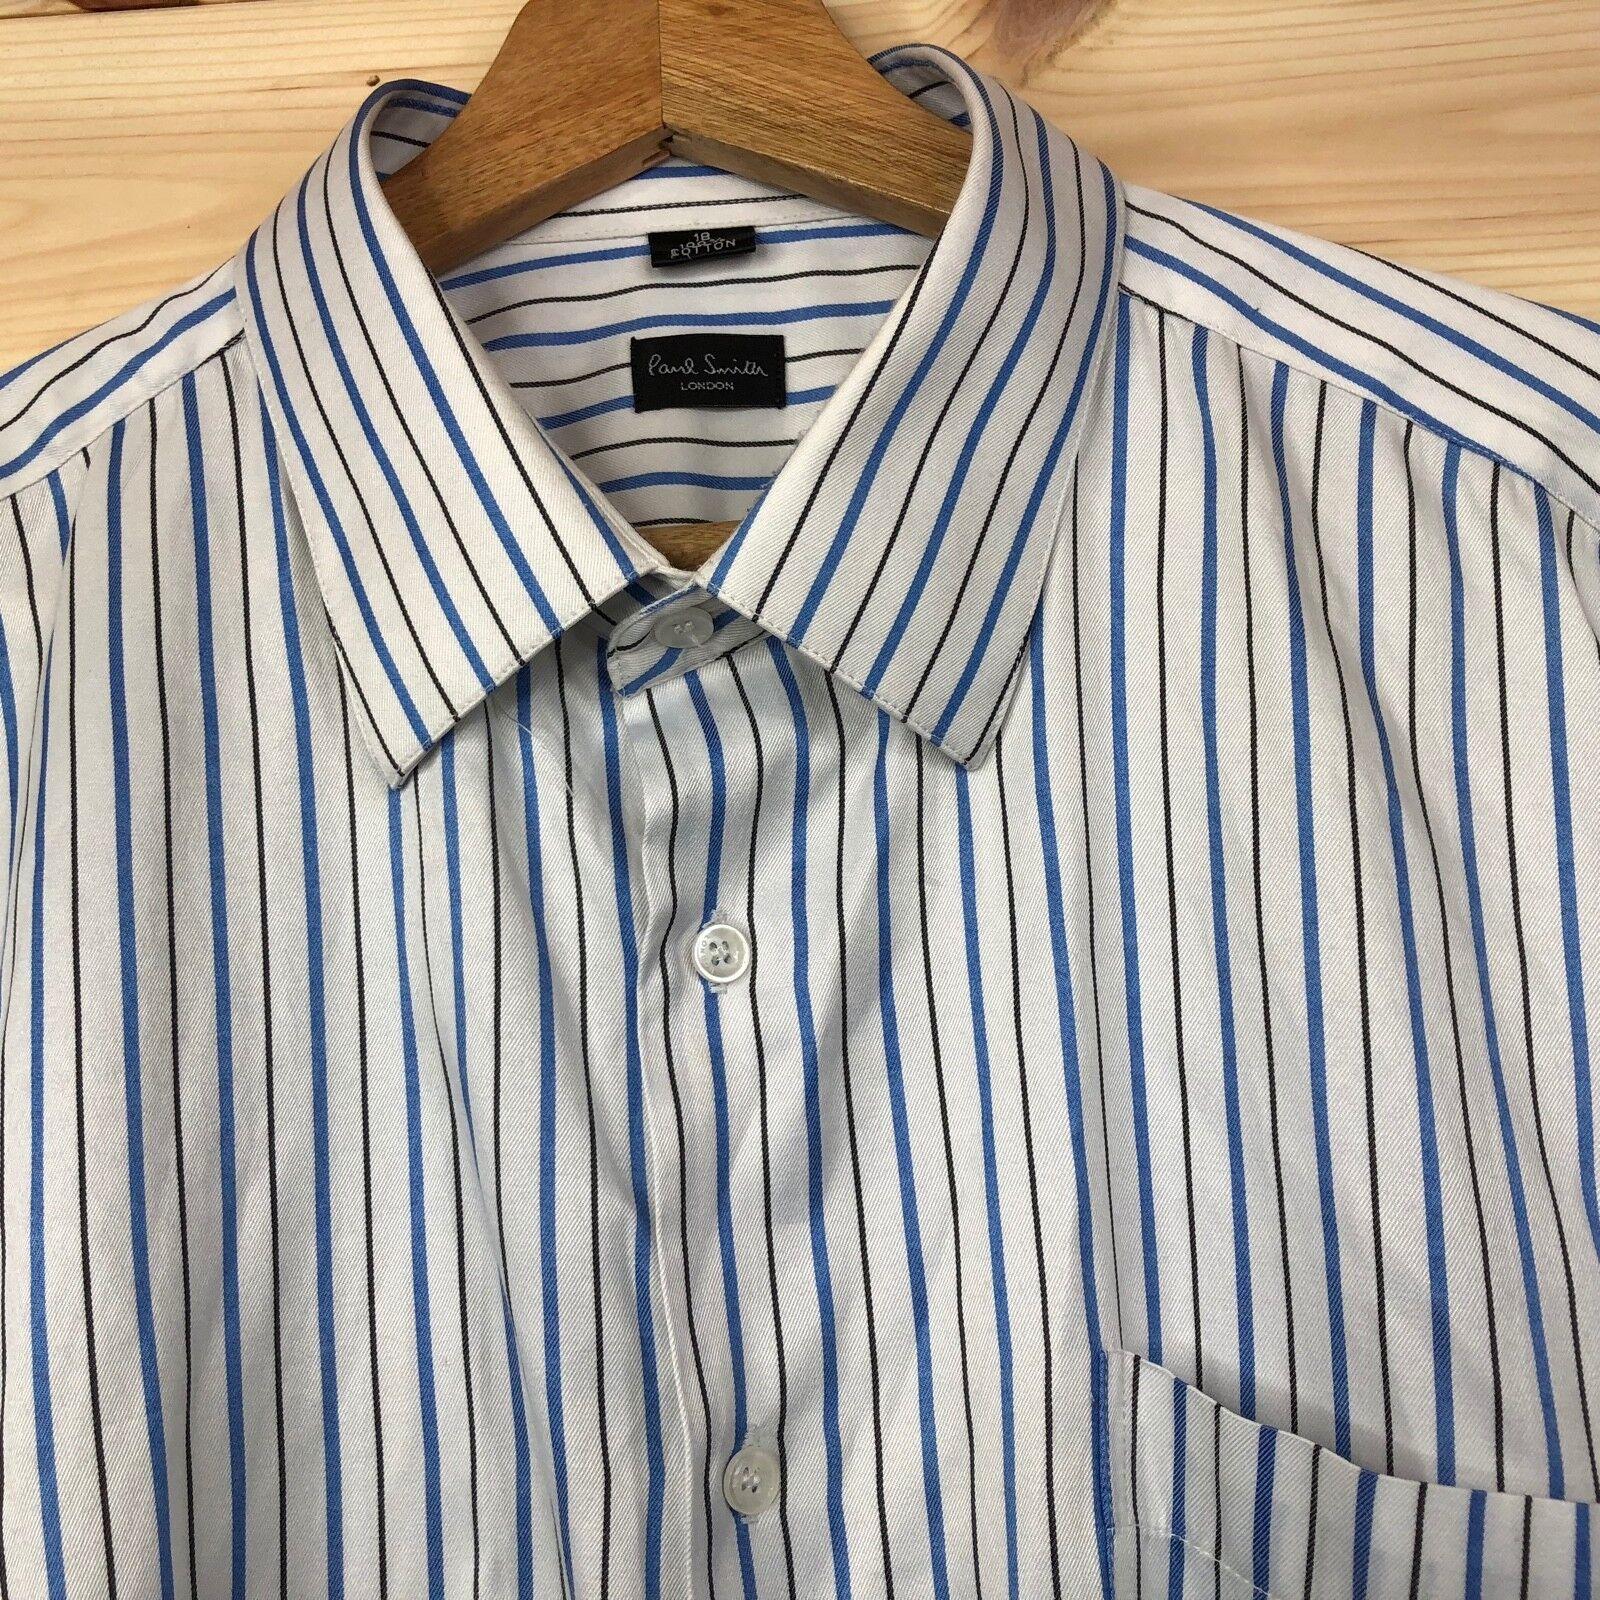 06f5fd3c53e Paul Smith Multi Stripe Shirt 18 RRP + White navlgx4903-Casual ...